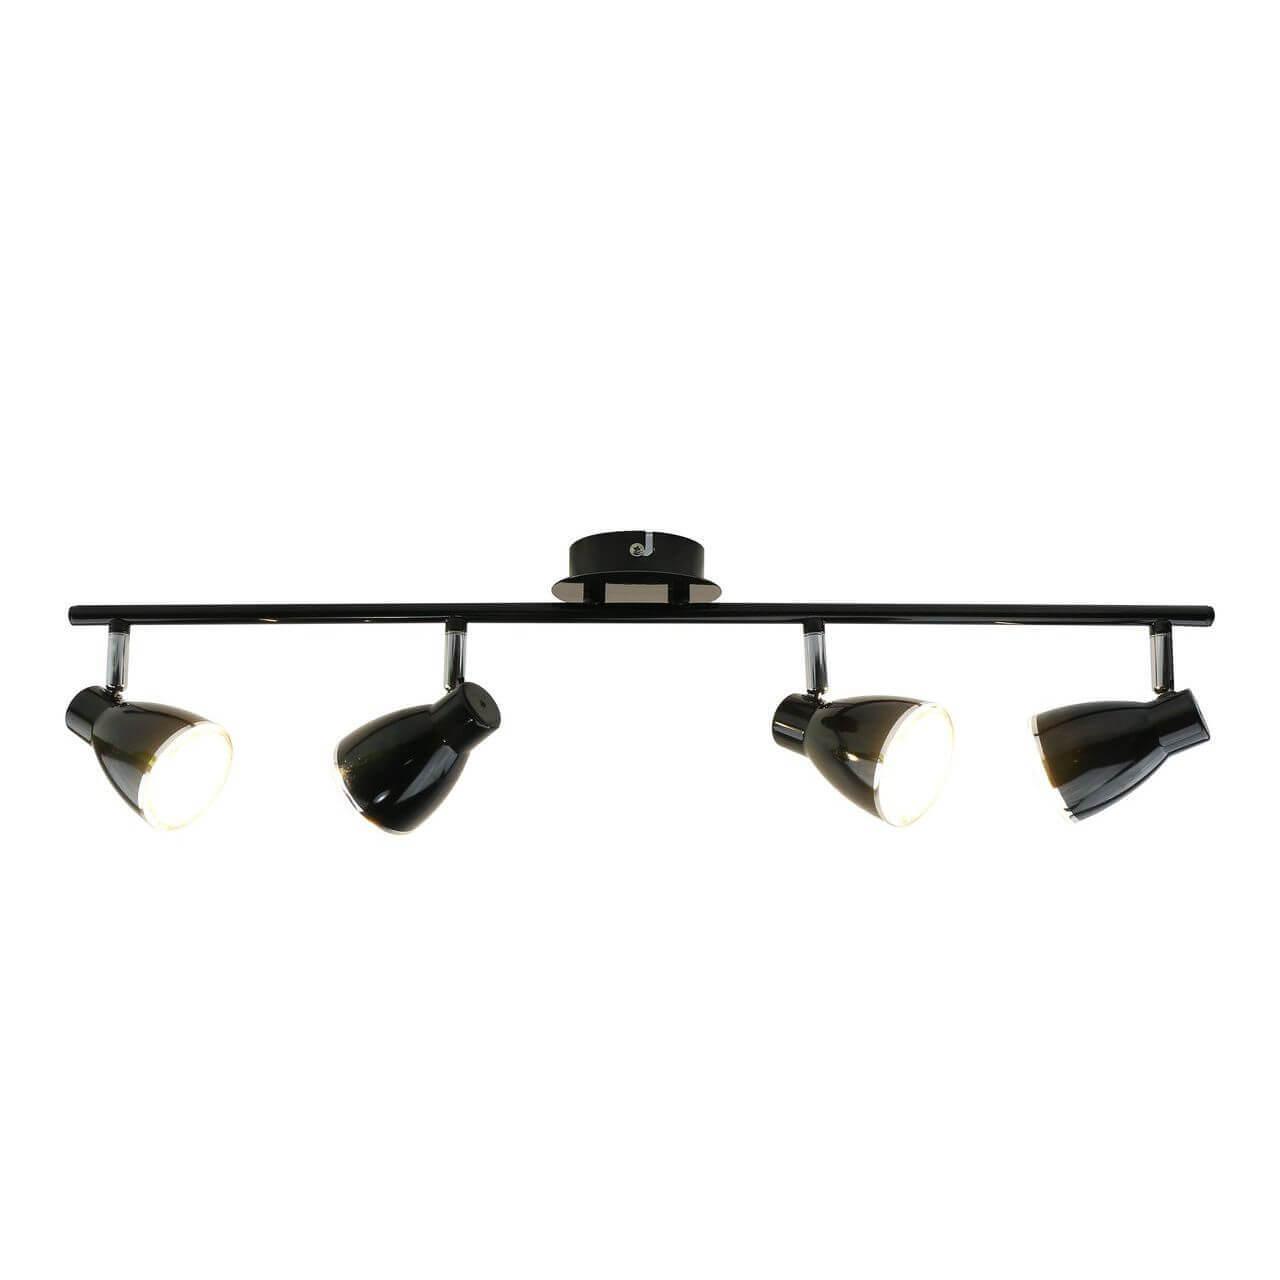 цена на Спот Arte Lamp A6008PL-4BK Gioved Black